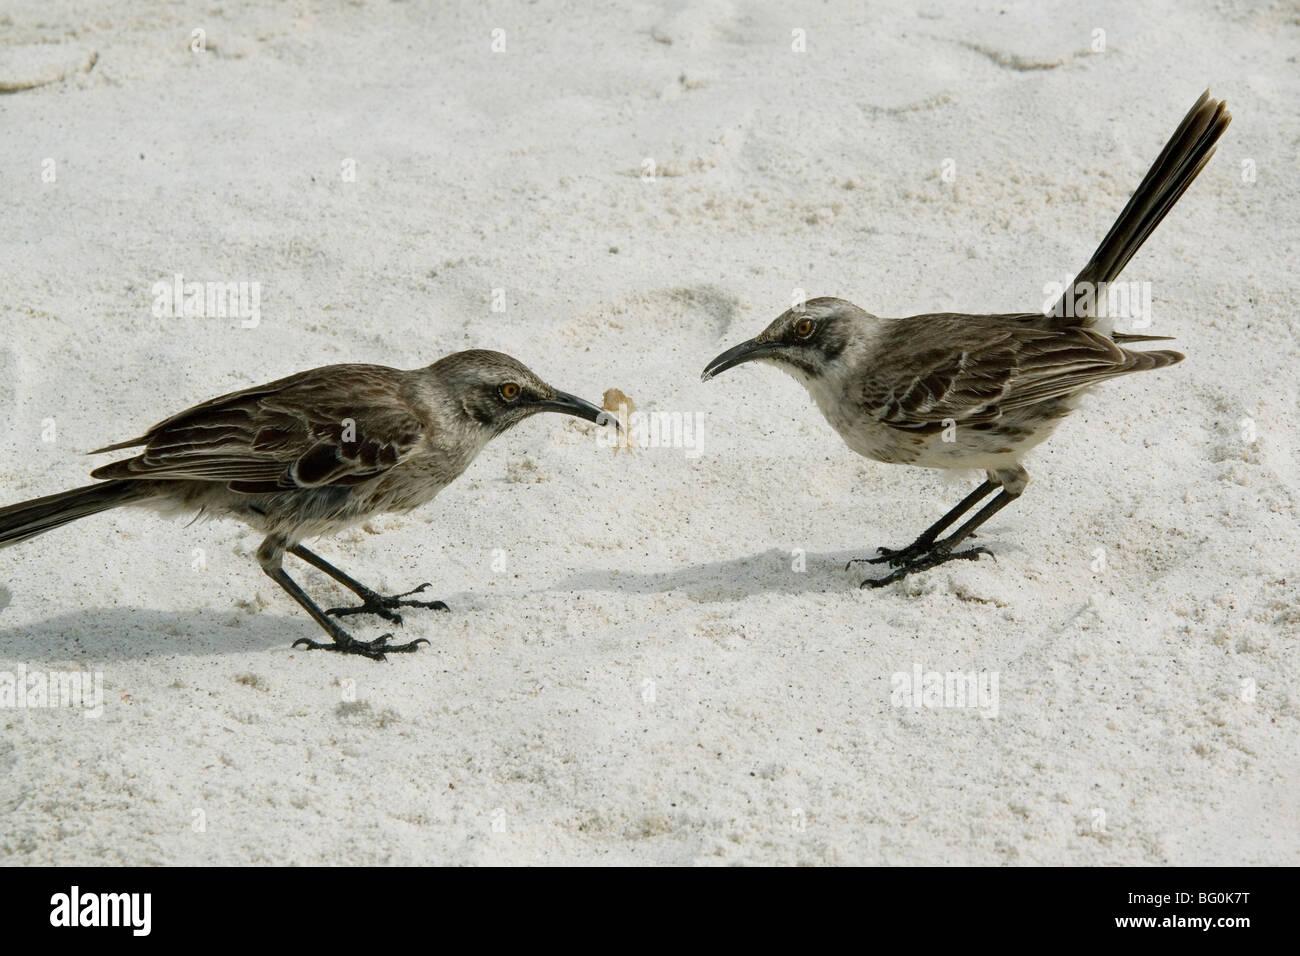 Mocking birds, Espanola Island, Galapagos, Ecudaor, South America - Stock Image